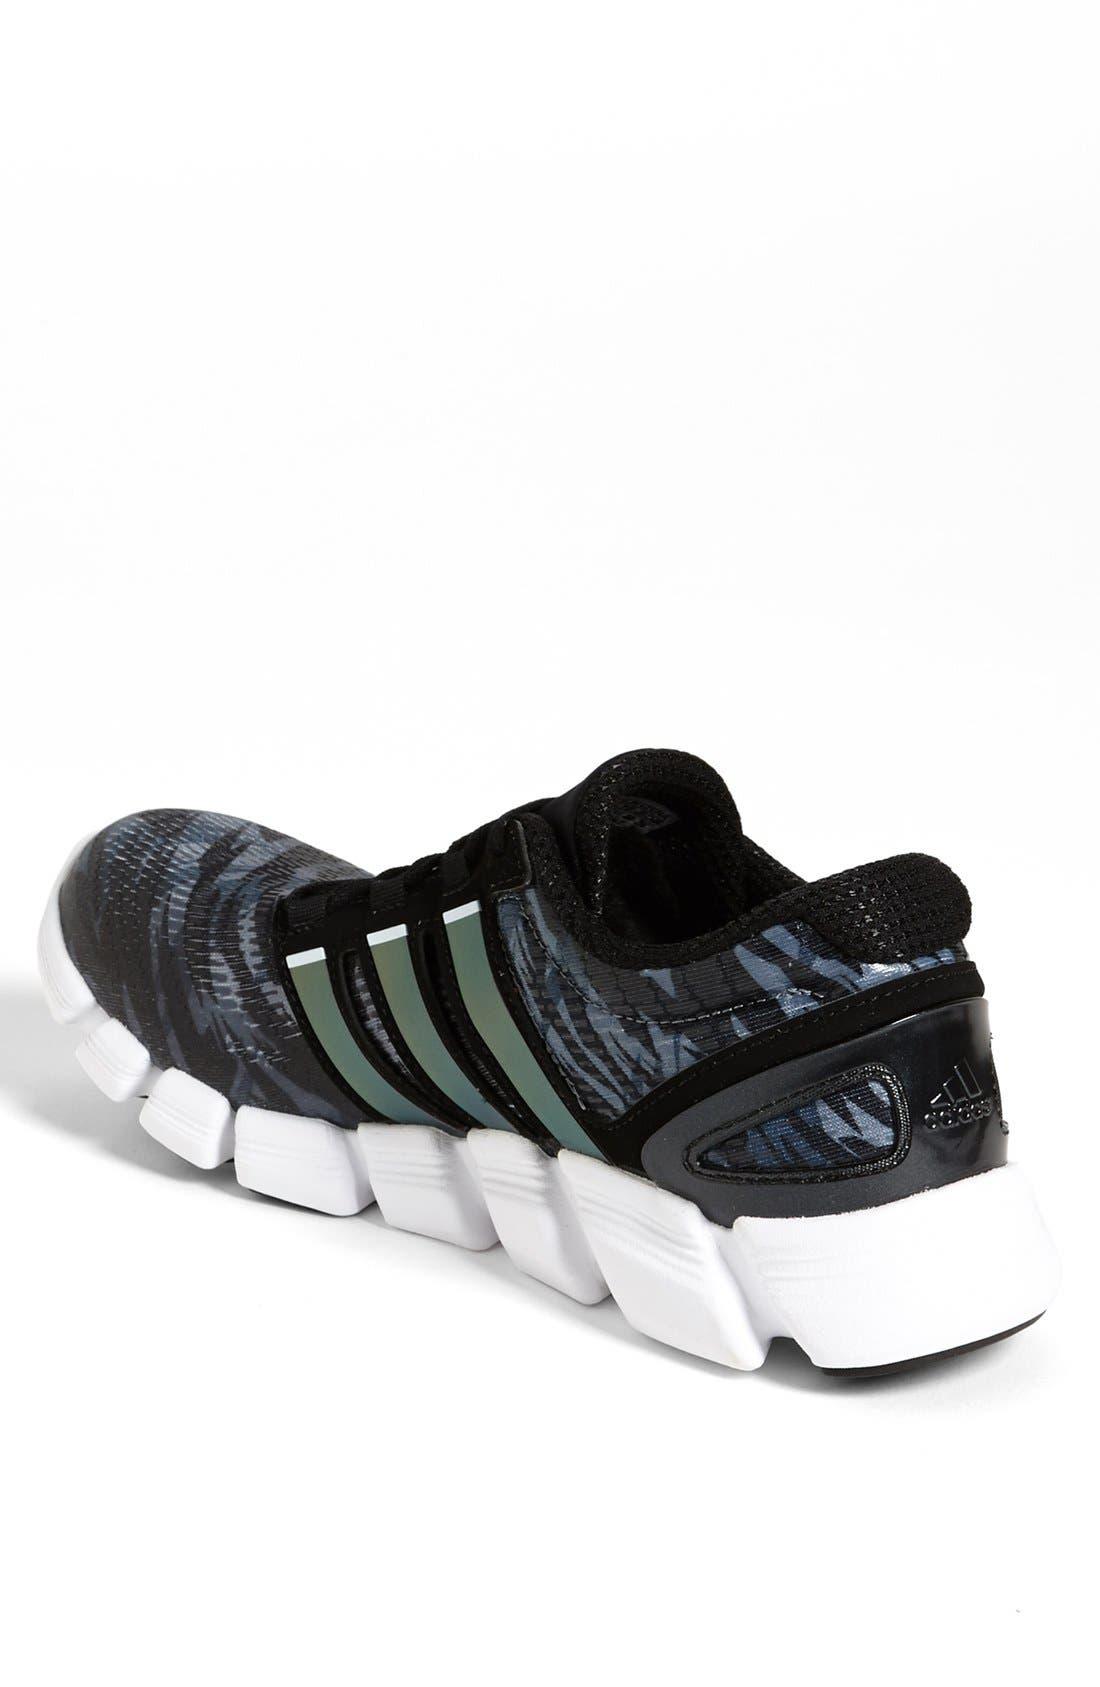 Alternate Image 2  - adidas 'adiPure CrazyQuick' Running Shoe (Men)